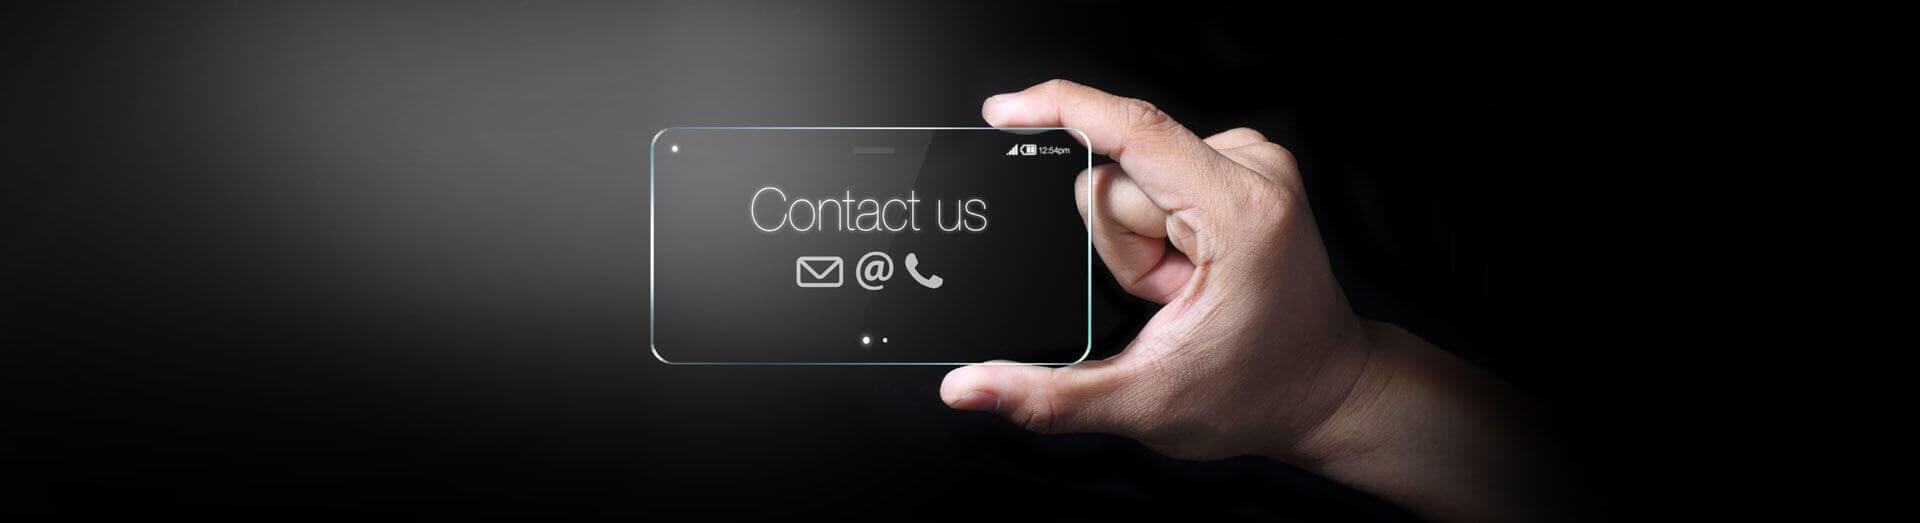 Contact Uniplast UNIPLAST